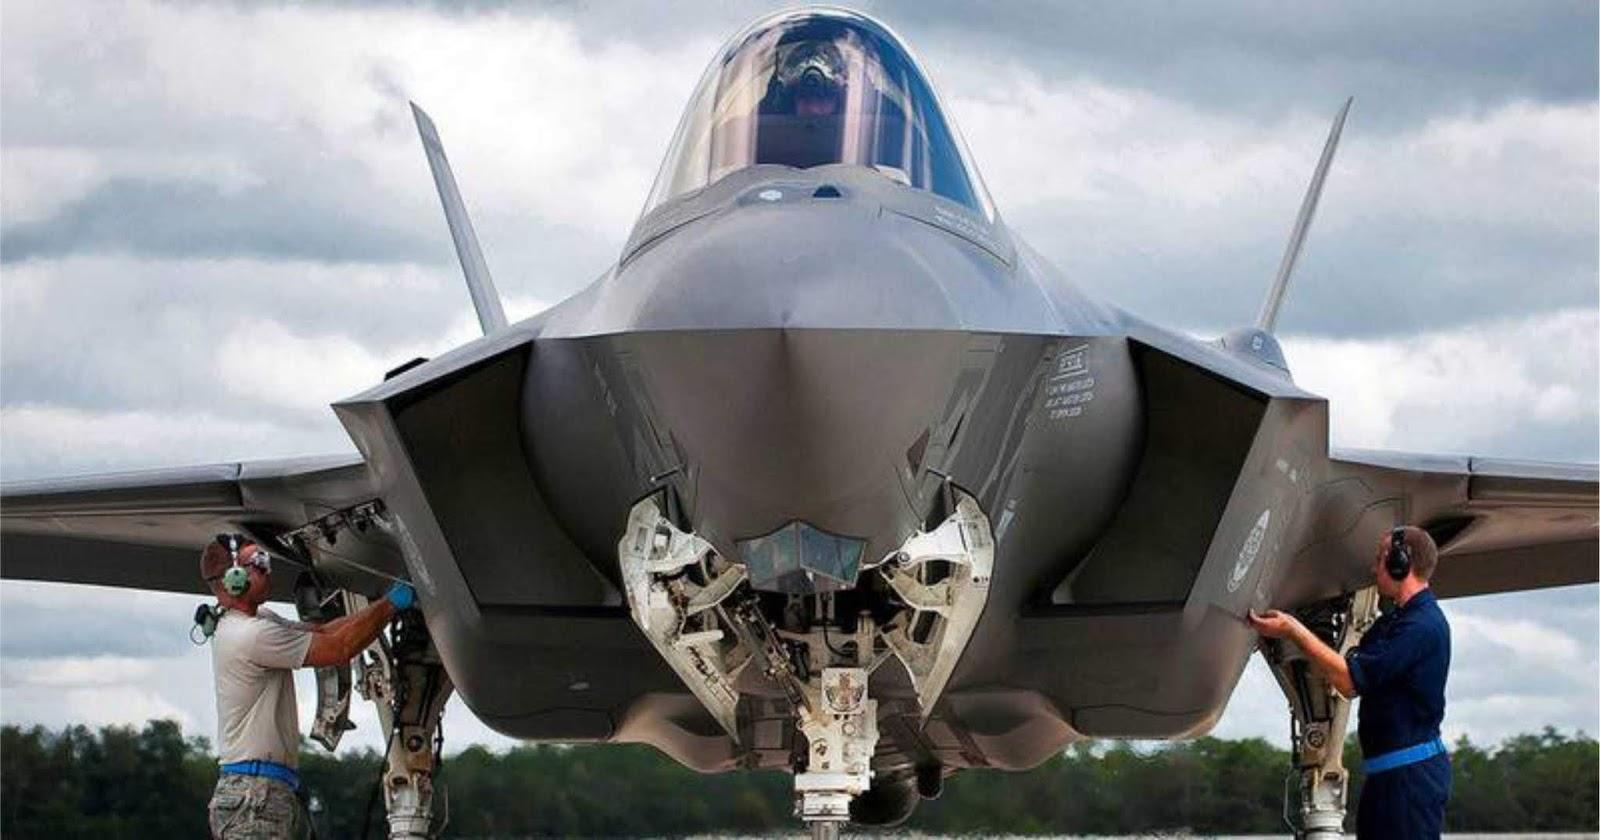 Polandia berencana membeli pesawat tempur F-35